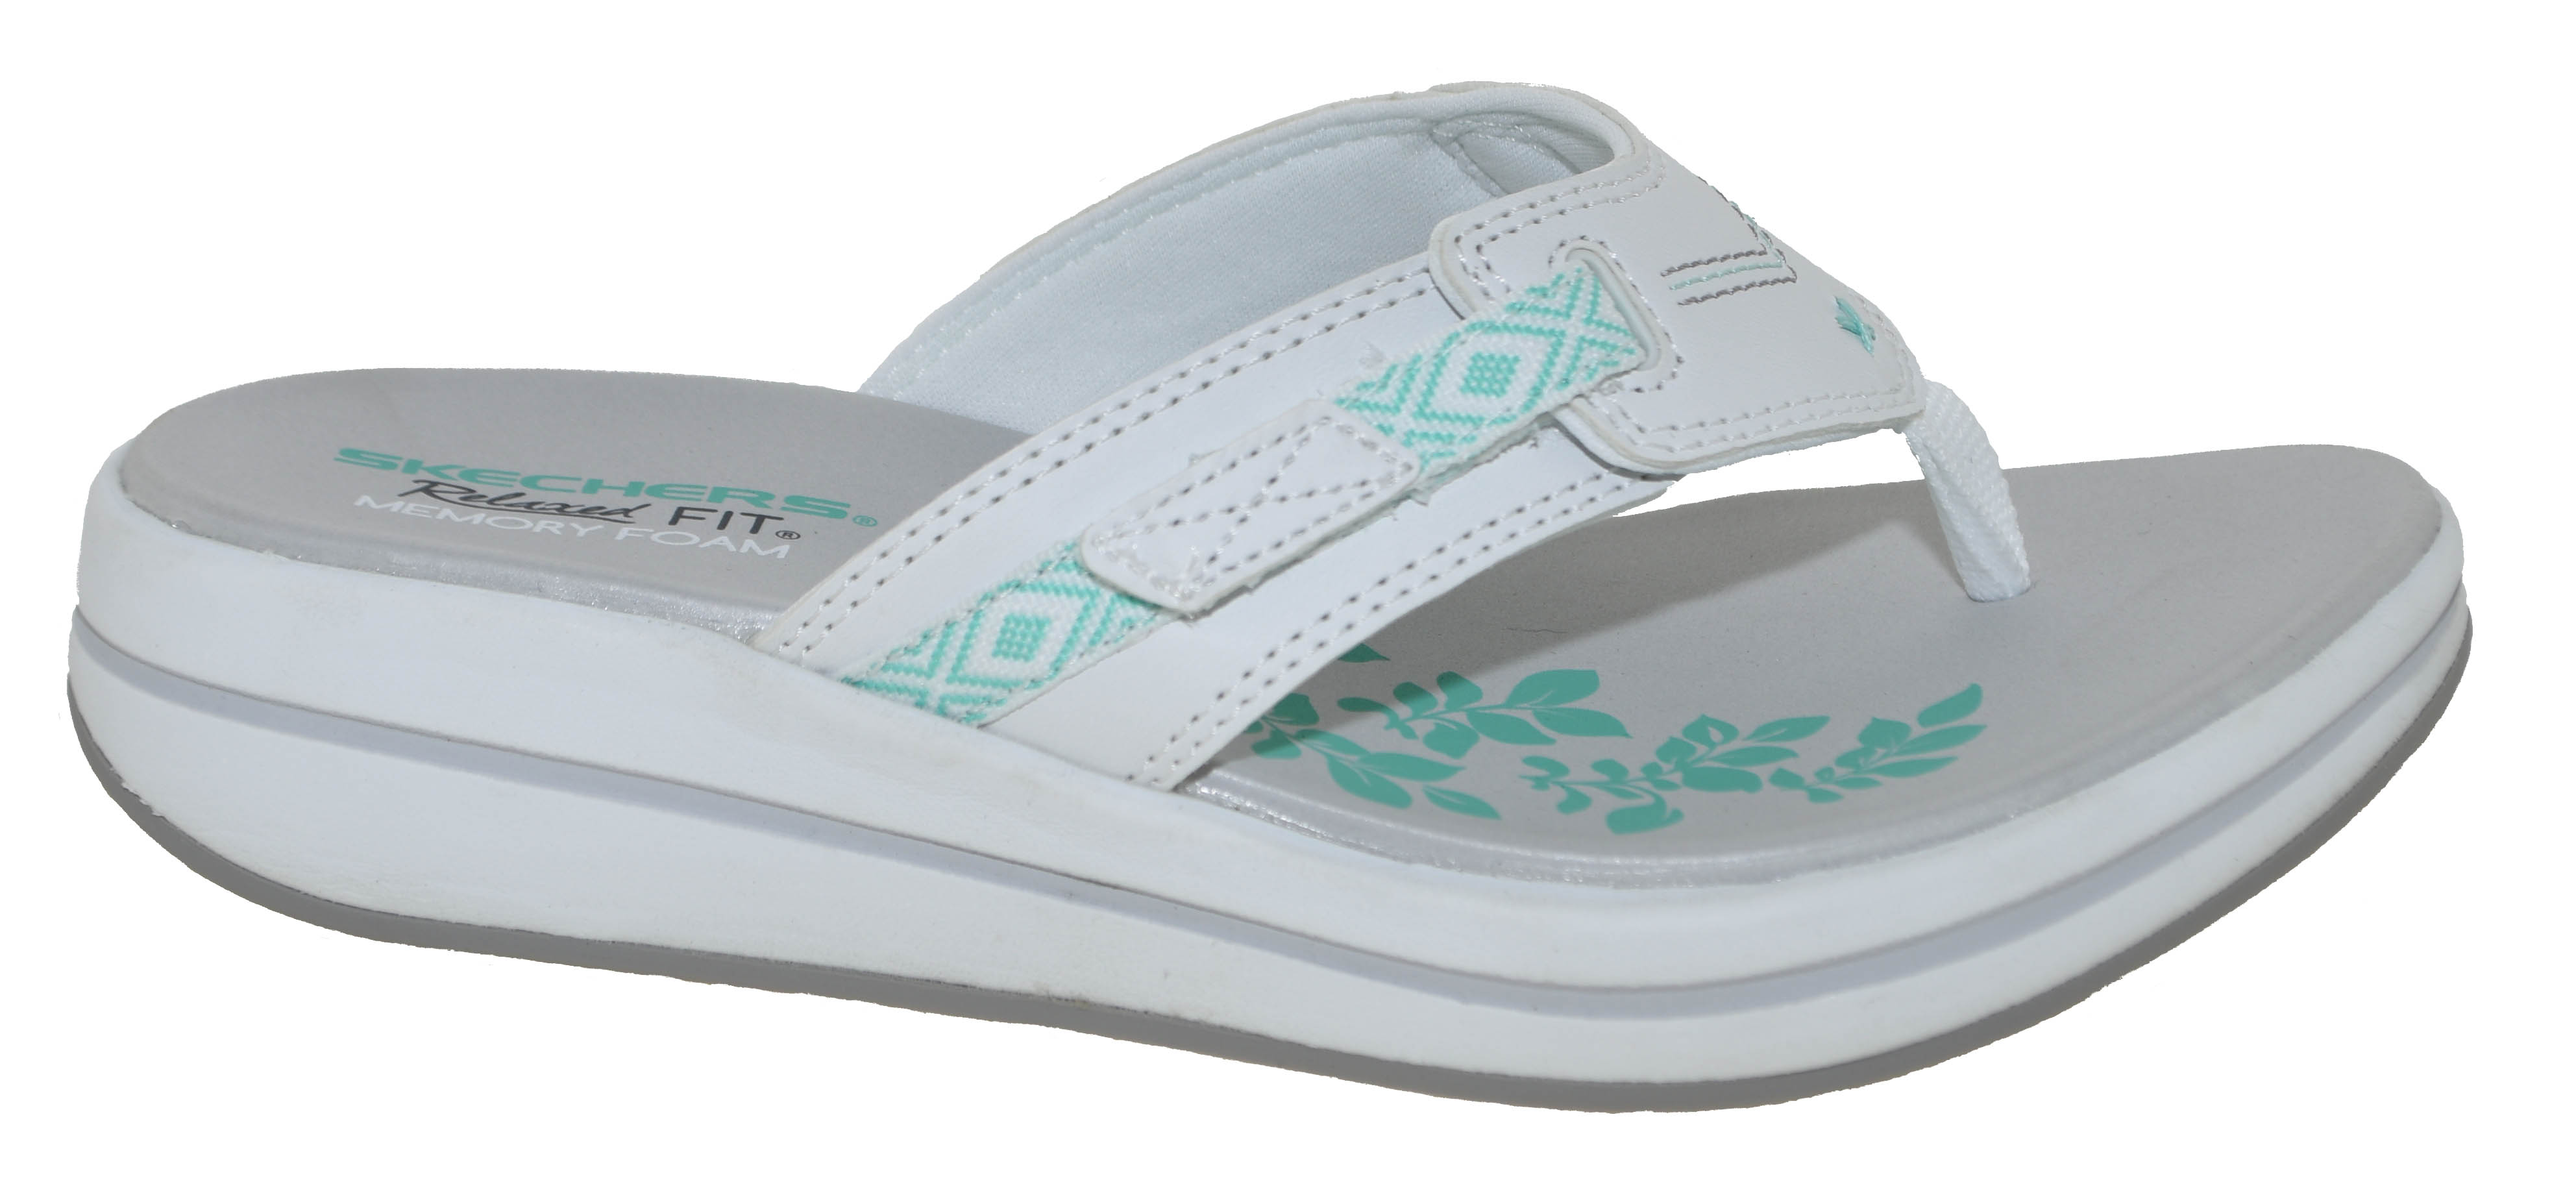 Women's SKECHERS Marina Bay Memory Foam Relaxed Fit Sandals Dark Taupe 8 9 | eBay